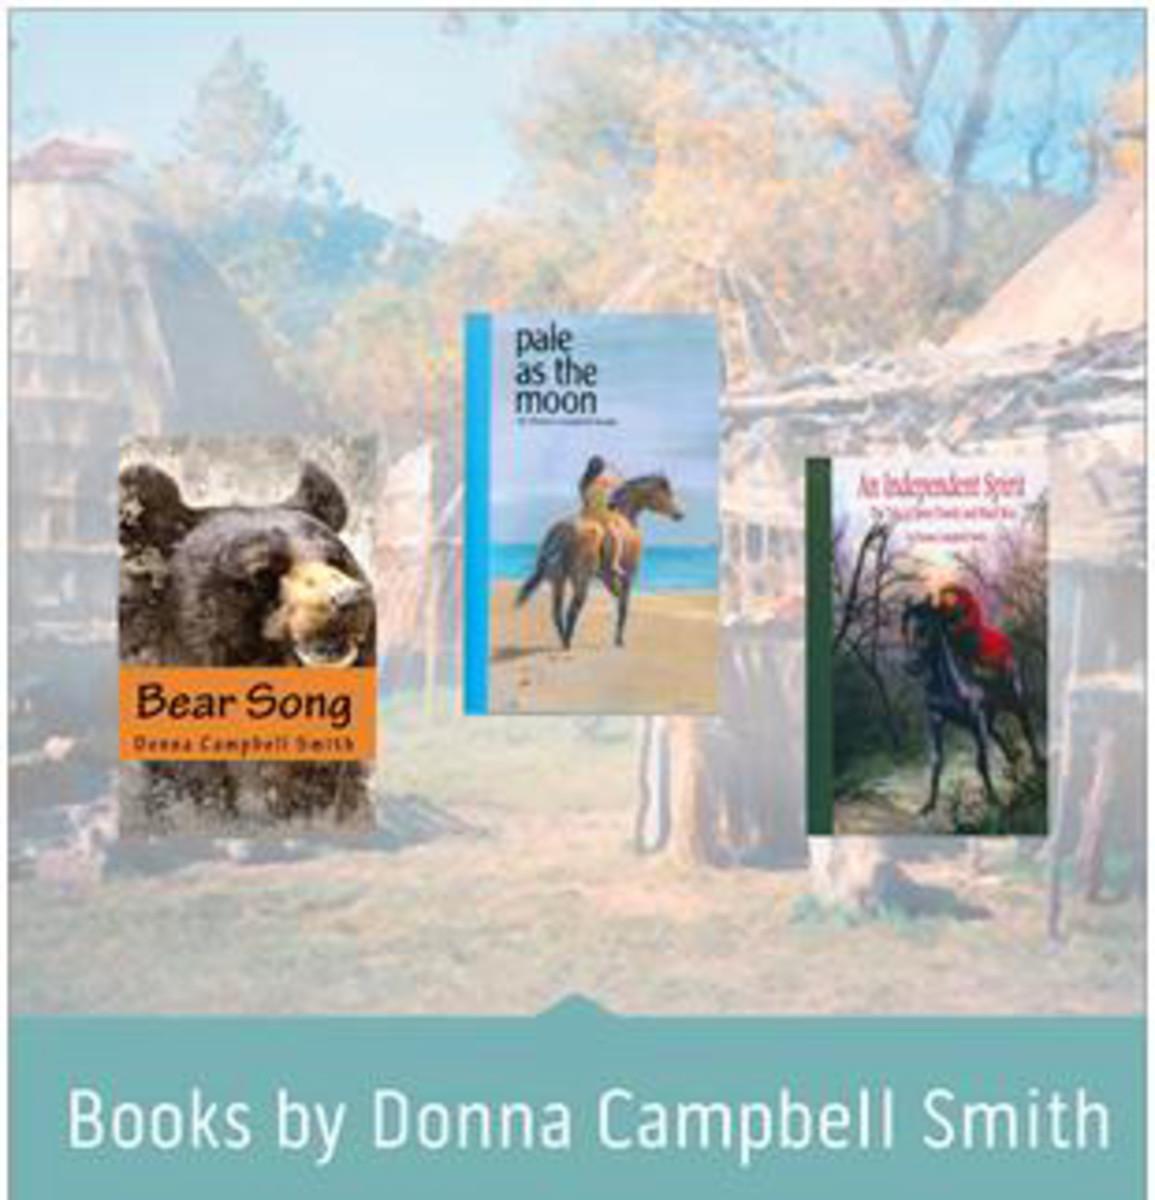 Self-Published Books